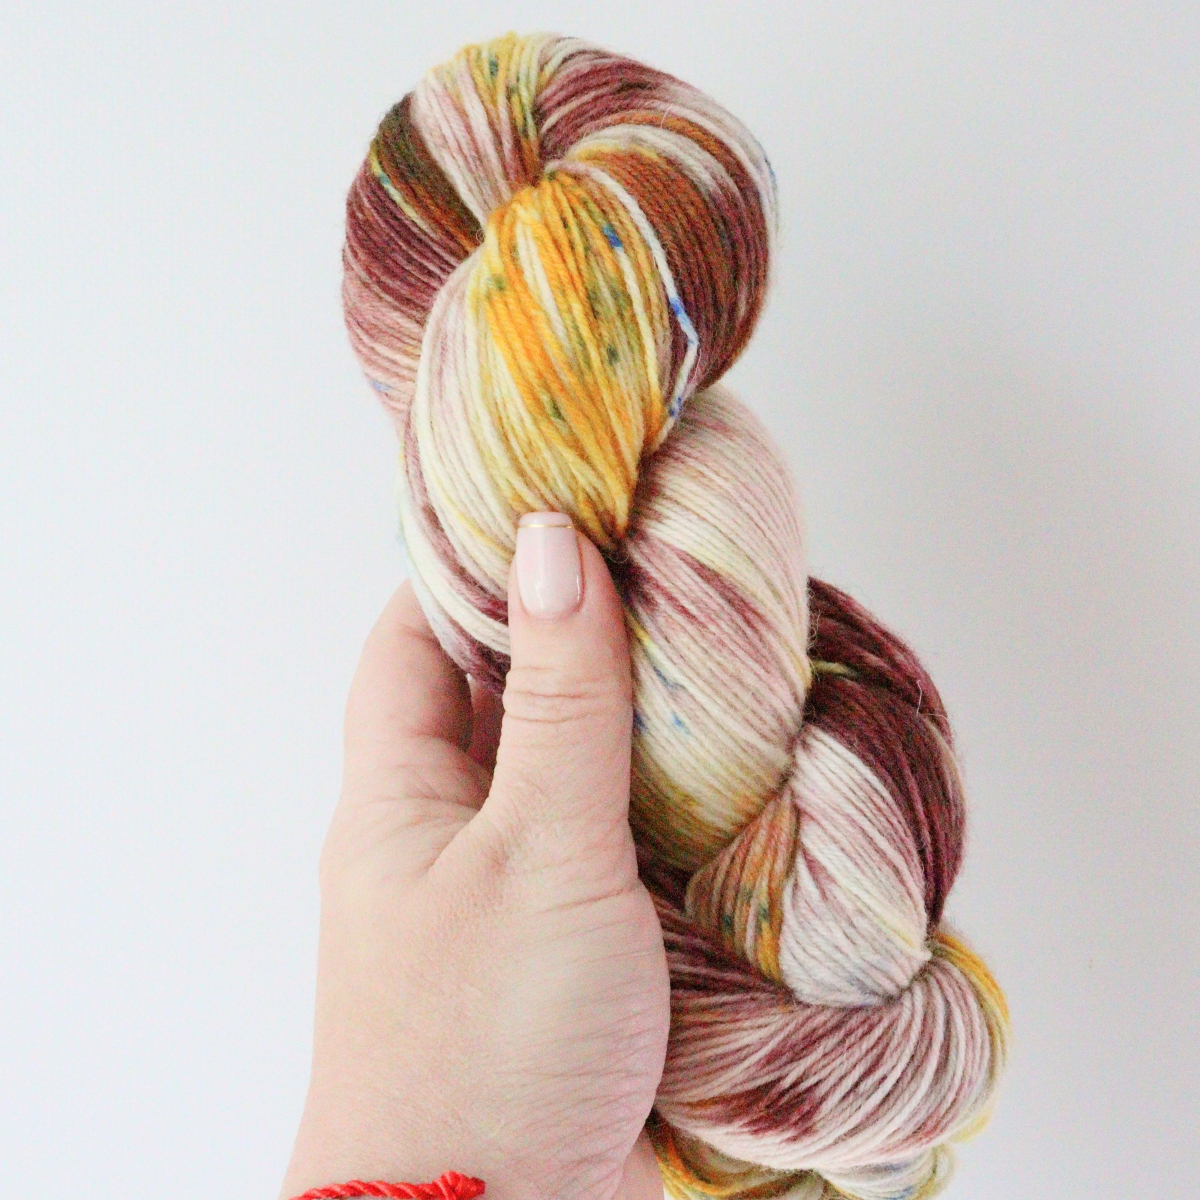 woodico.pro hand dyed yarn 089 5 1200x1200 - Hand dyed yarn / 089